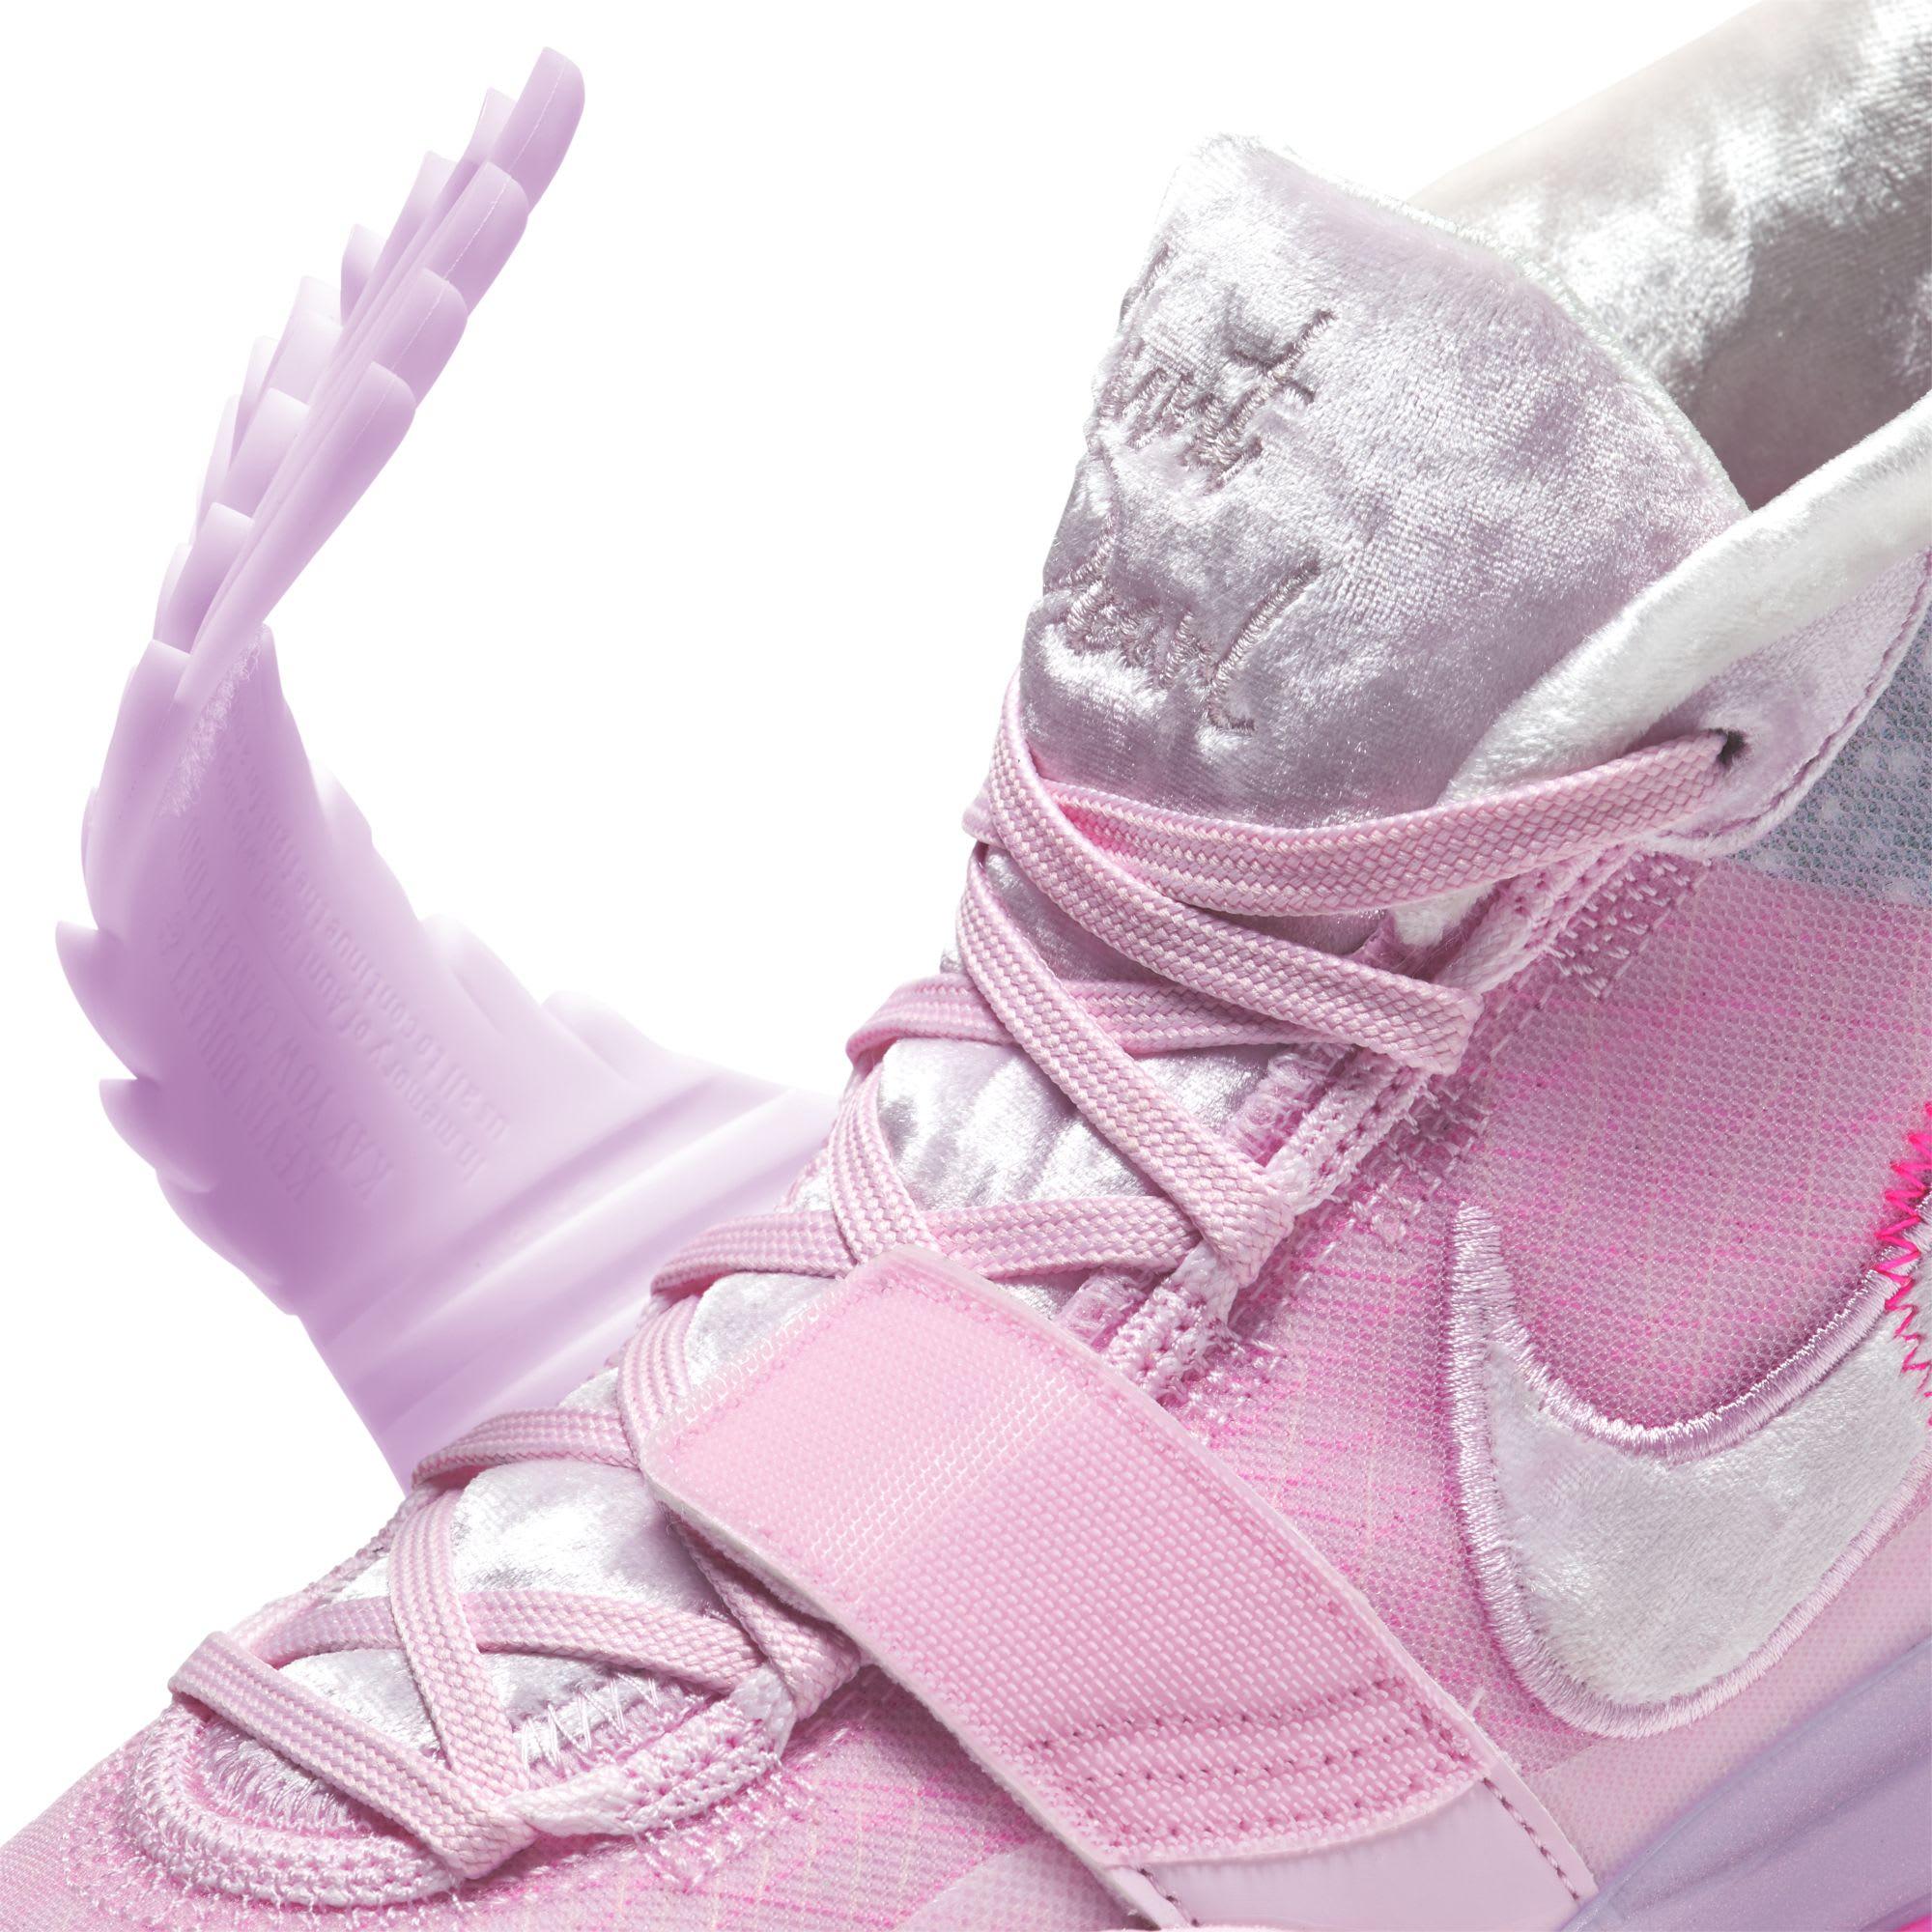 Nike KD 12 'Aunt Pearl' (Detail)